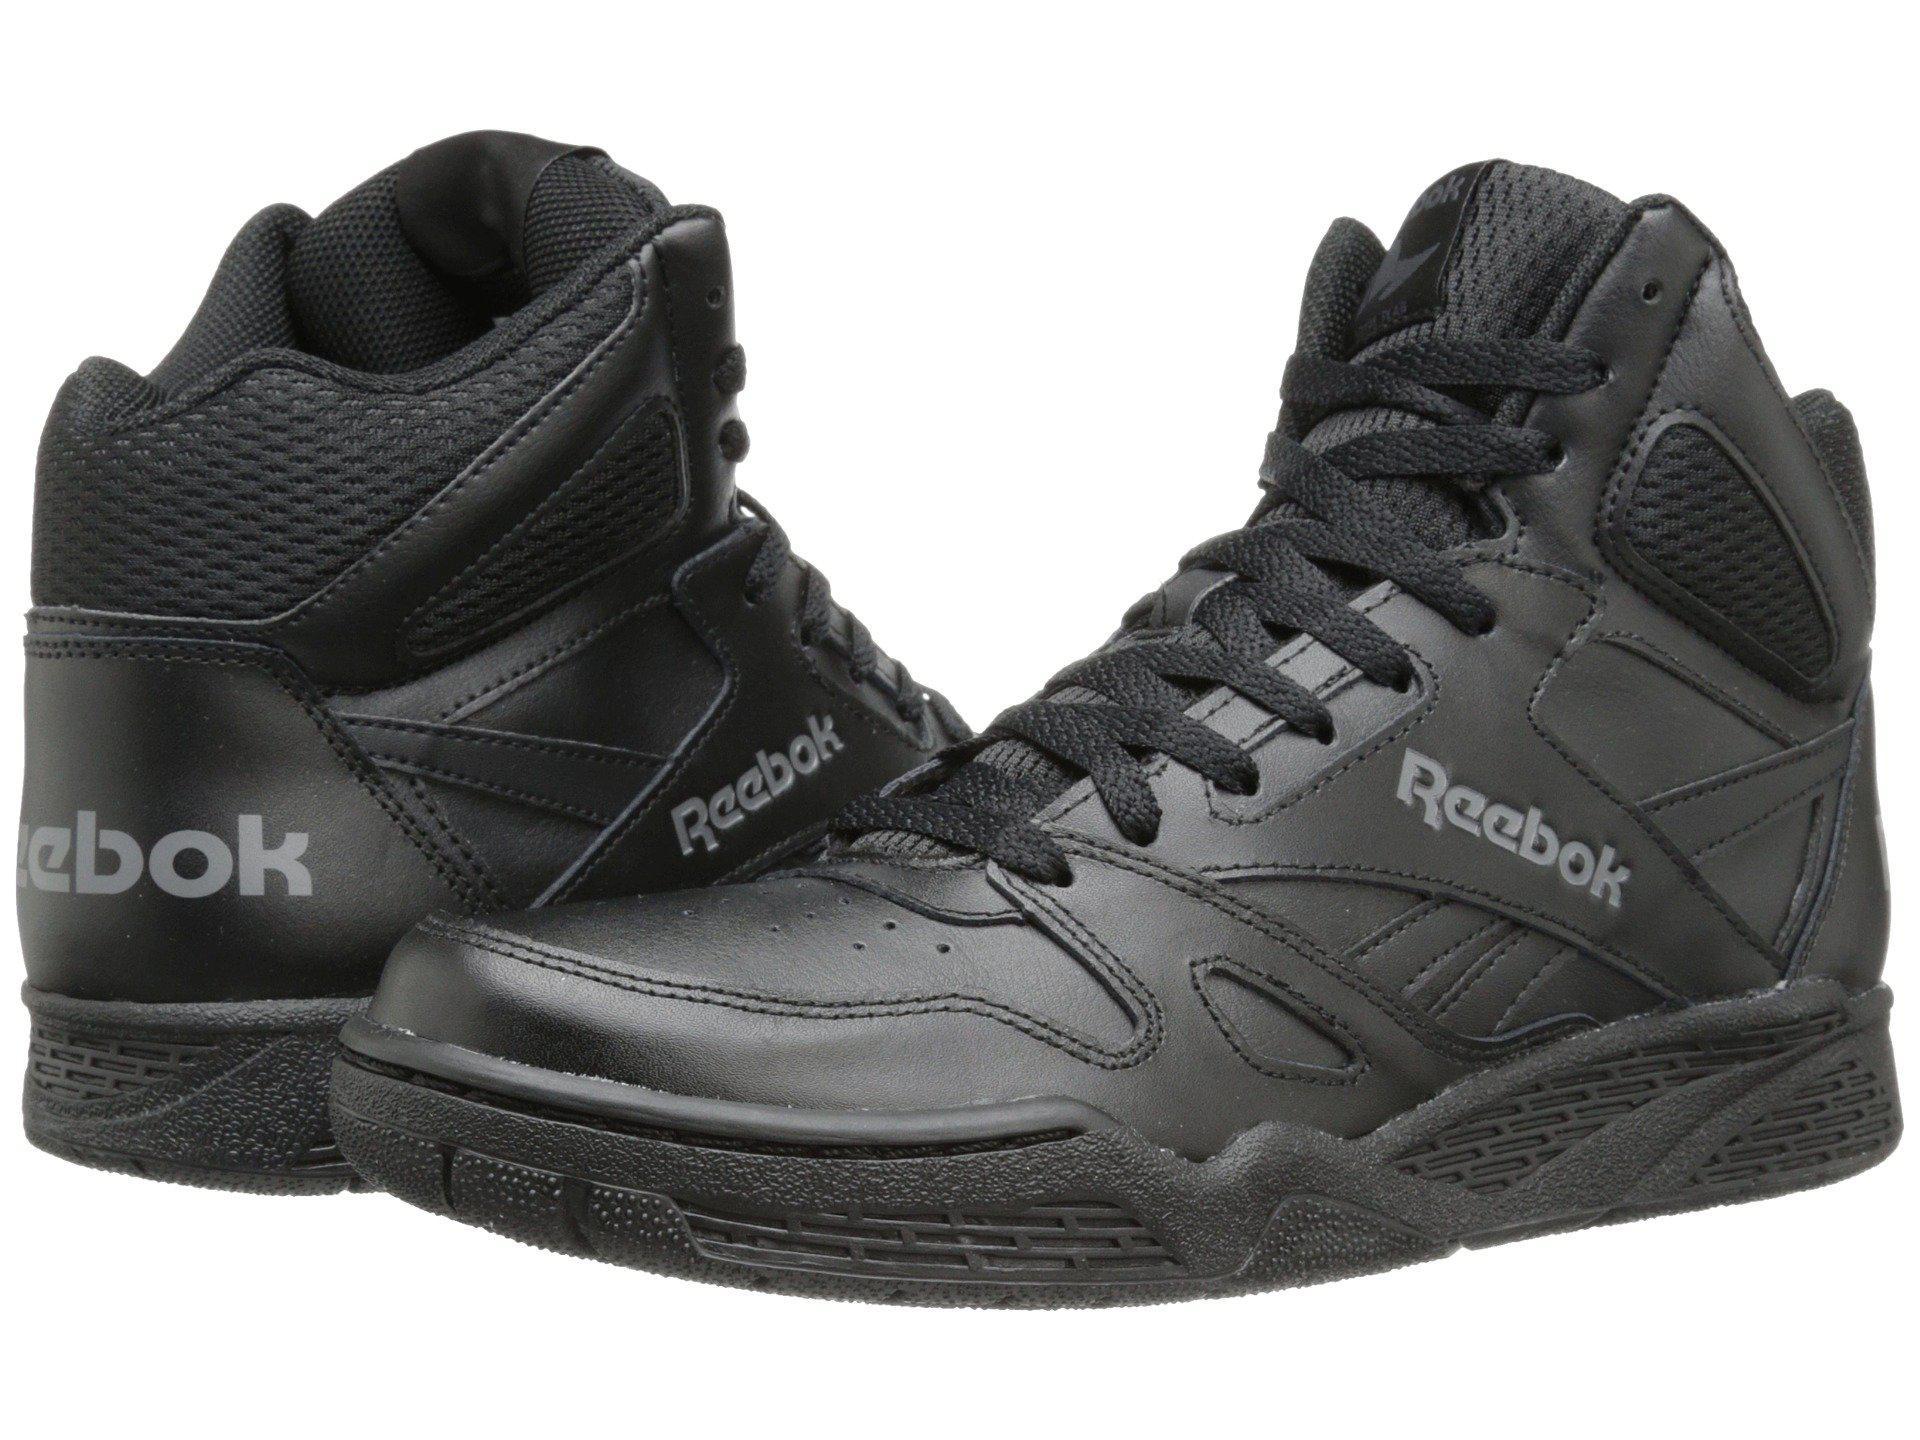 de68ee4ced9 Reebok - Royal Bb4500 Hi (black shark) Men s Basketball Shoes for Men -.  View fullscreen